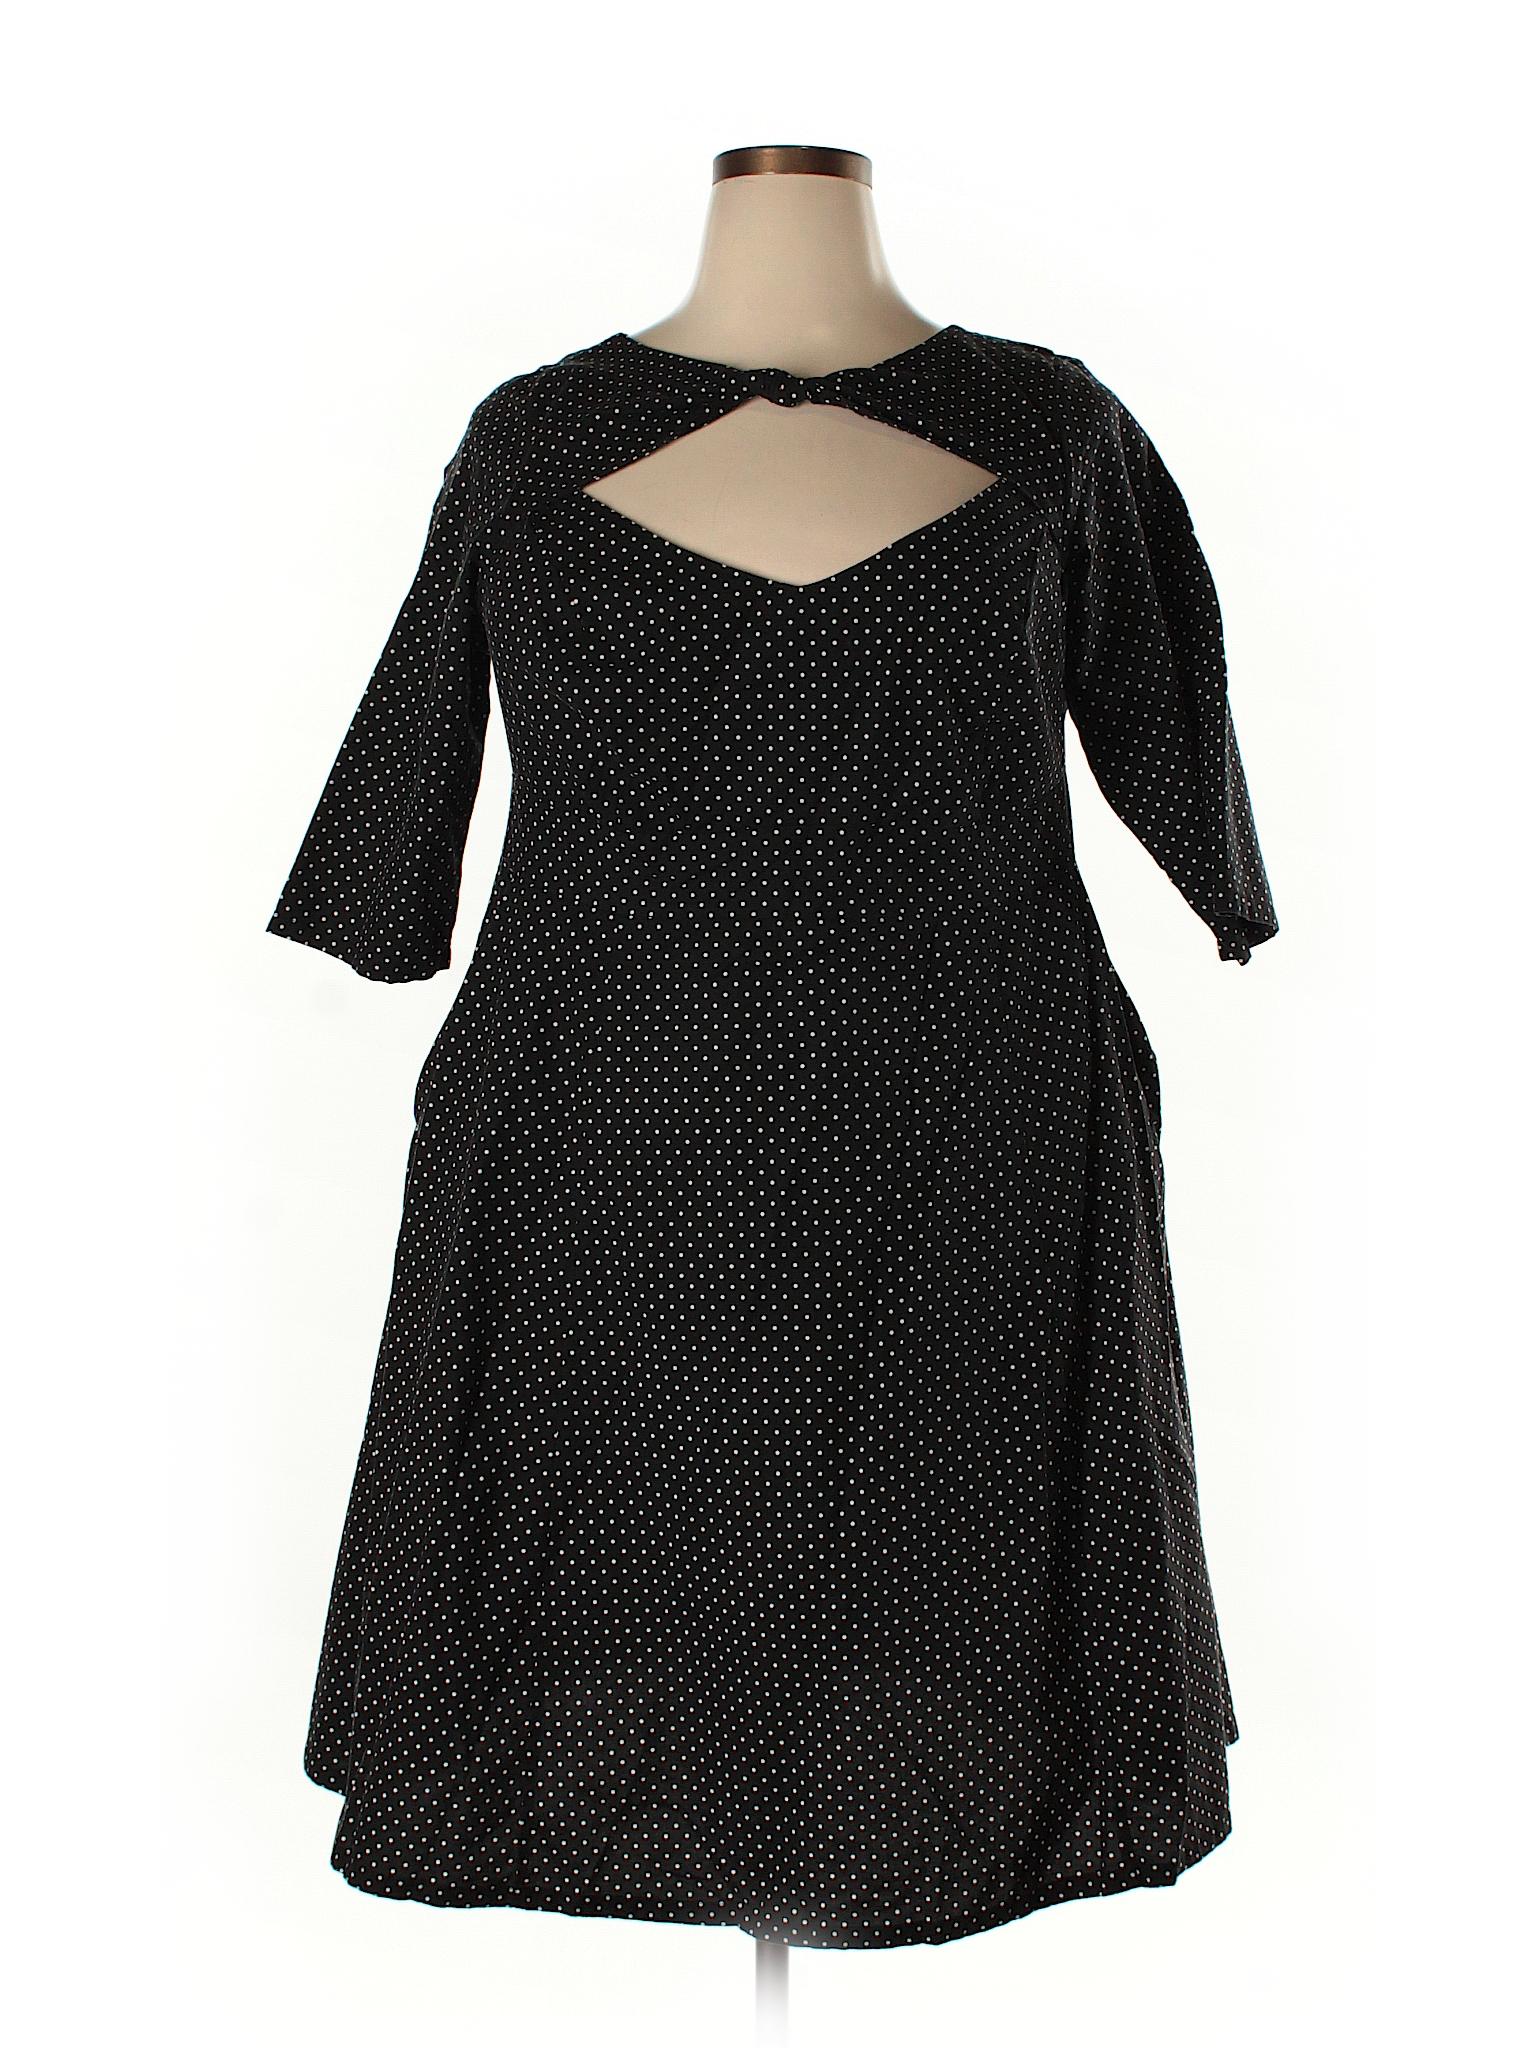 winter Cherry Boutique Casual Velvet Dress 6pU1wqd